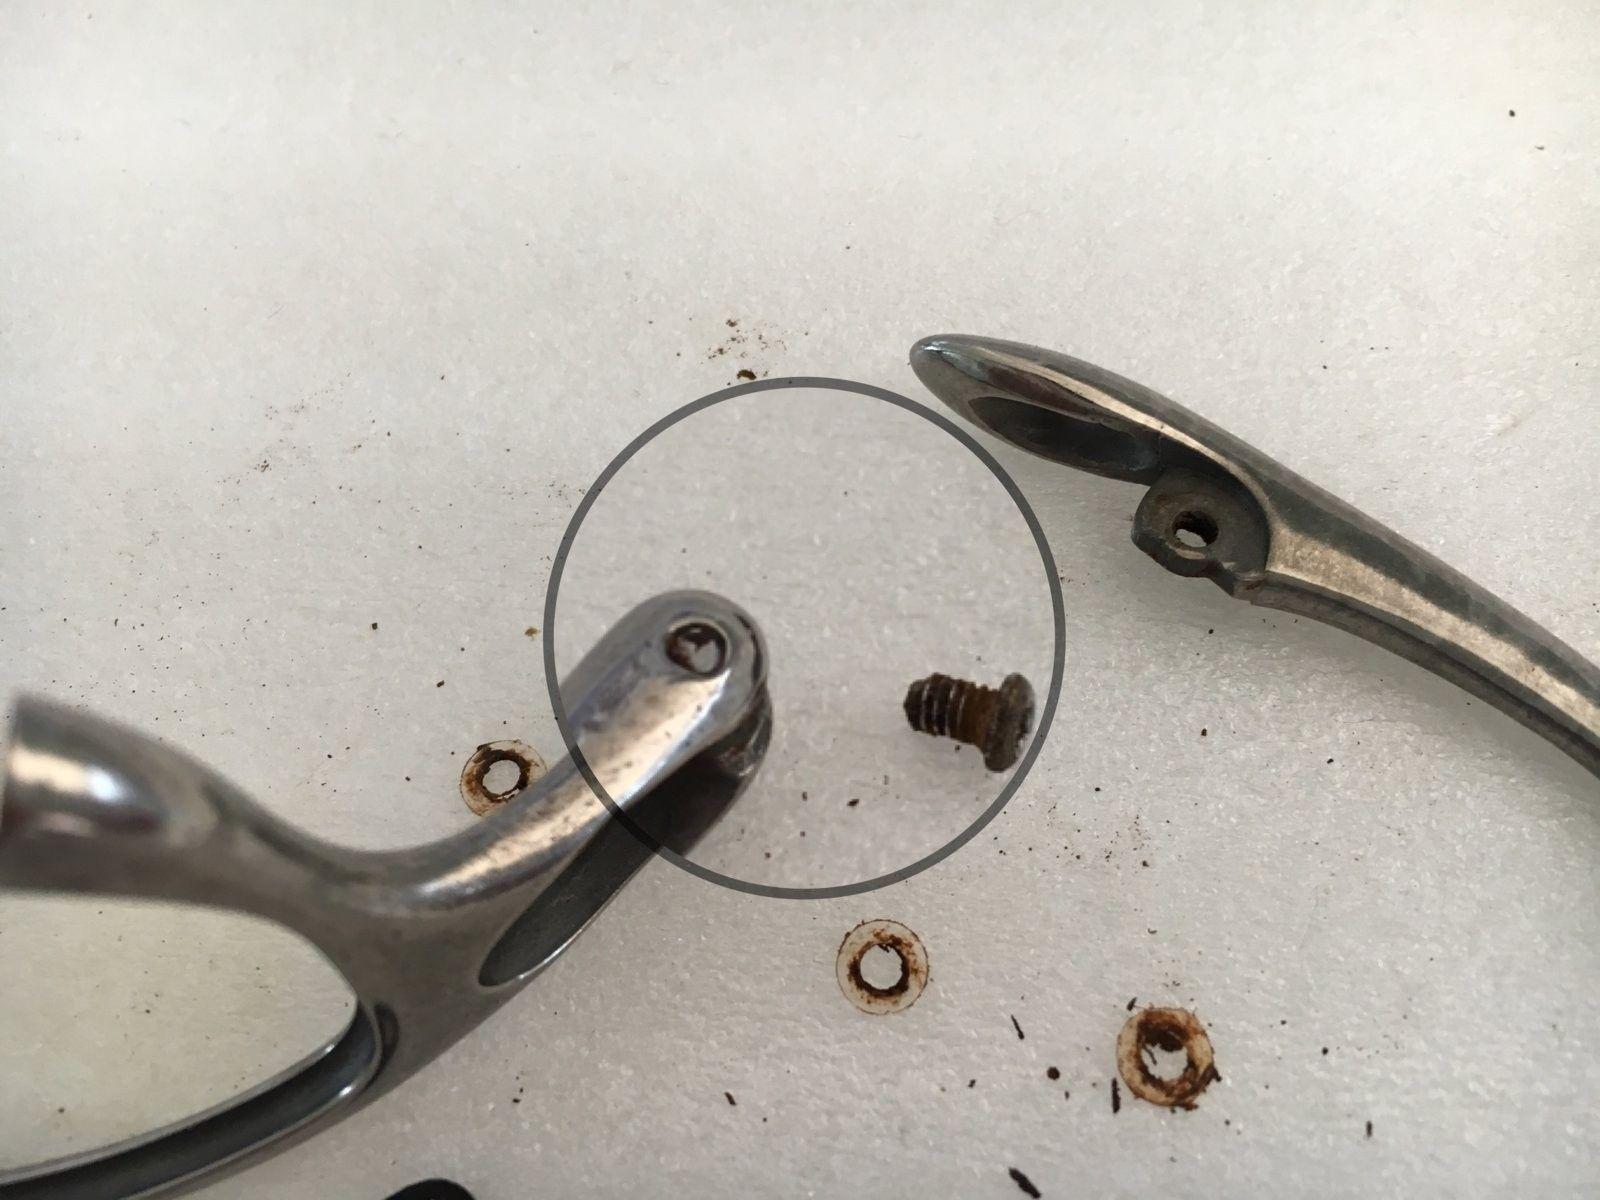 Help - fixing a stuck temple screw - IMG_5764.JPG